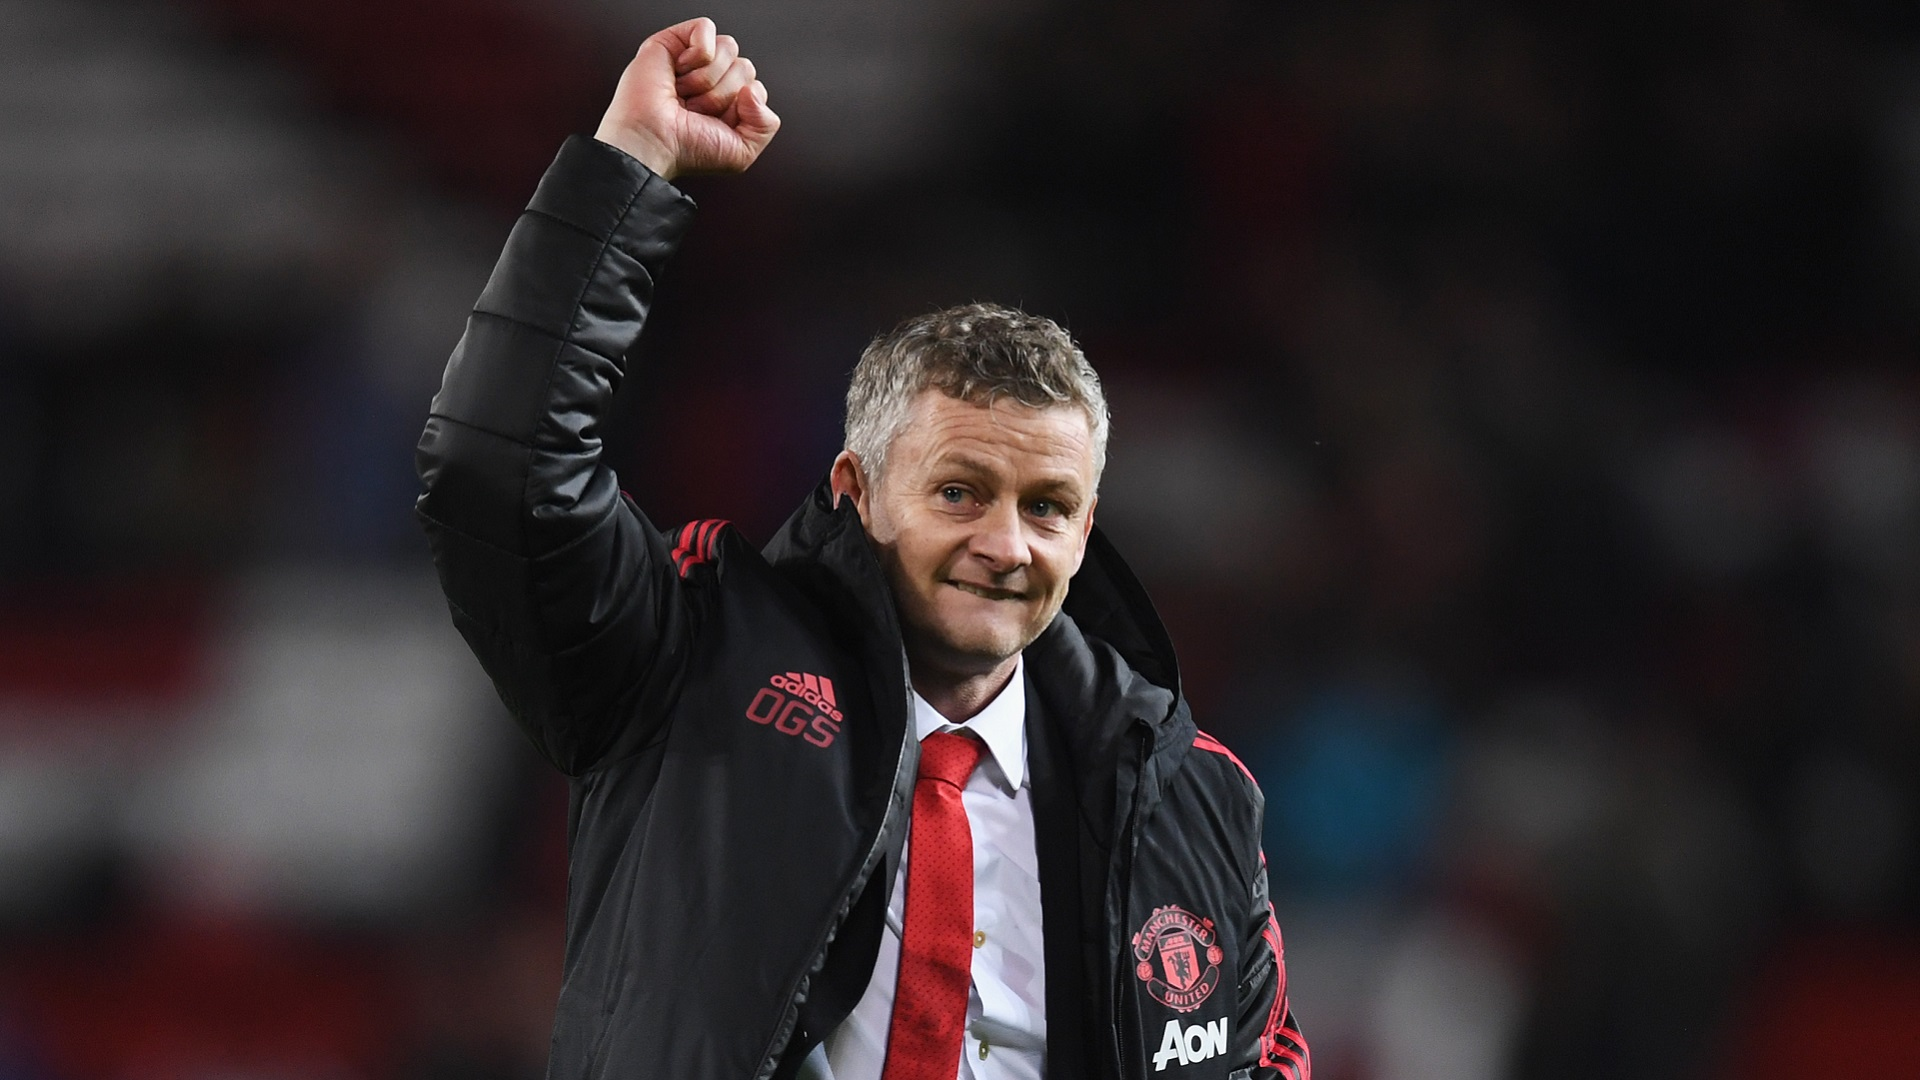 2018-12-31 Solskjaer Ole Gunnar Manchester United